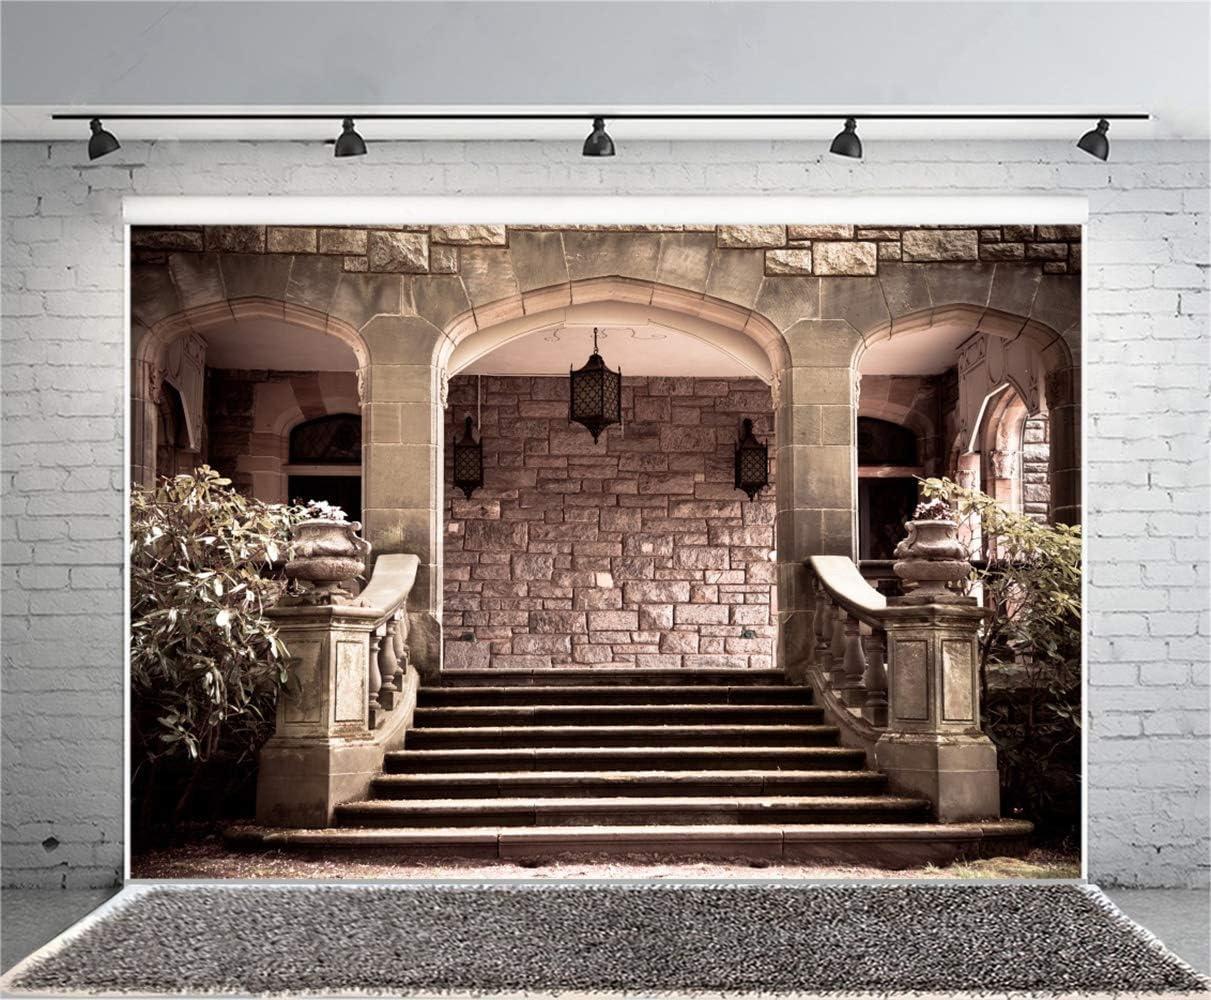 Vintage Stone Palace Pavilion Stairs Scene Backdrop Vinyl 10x8ft Old Castle Historical Cultural Architecture Black Lantern Background Wedding Shoot Tourism Resort Scenic Wallpaper Studio